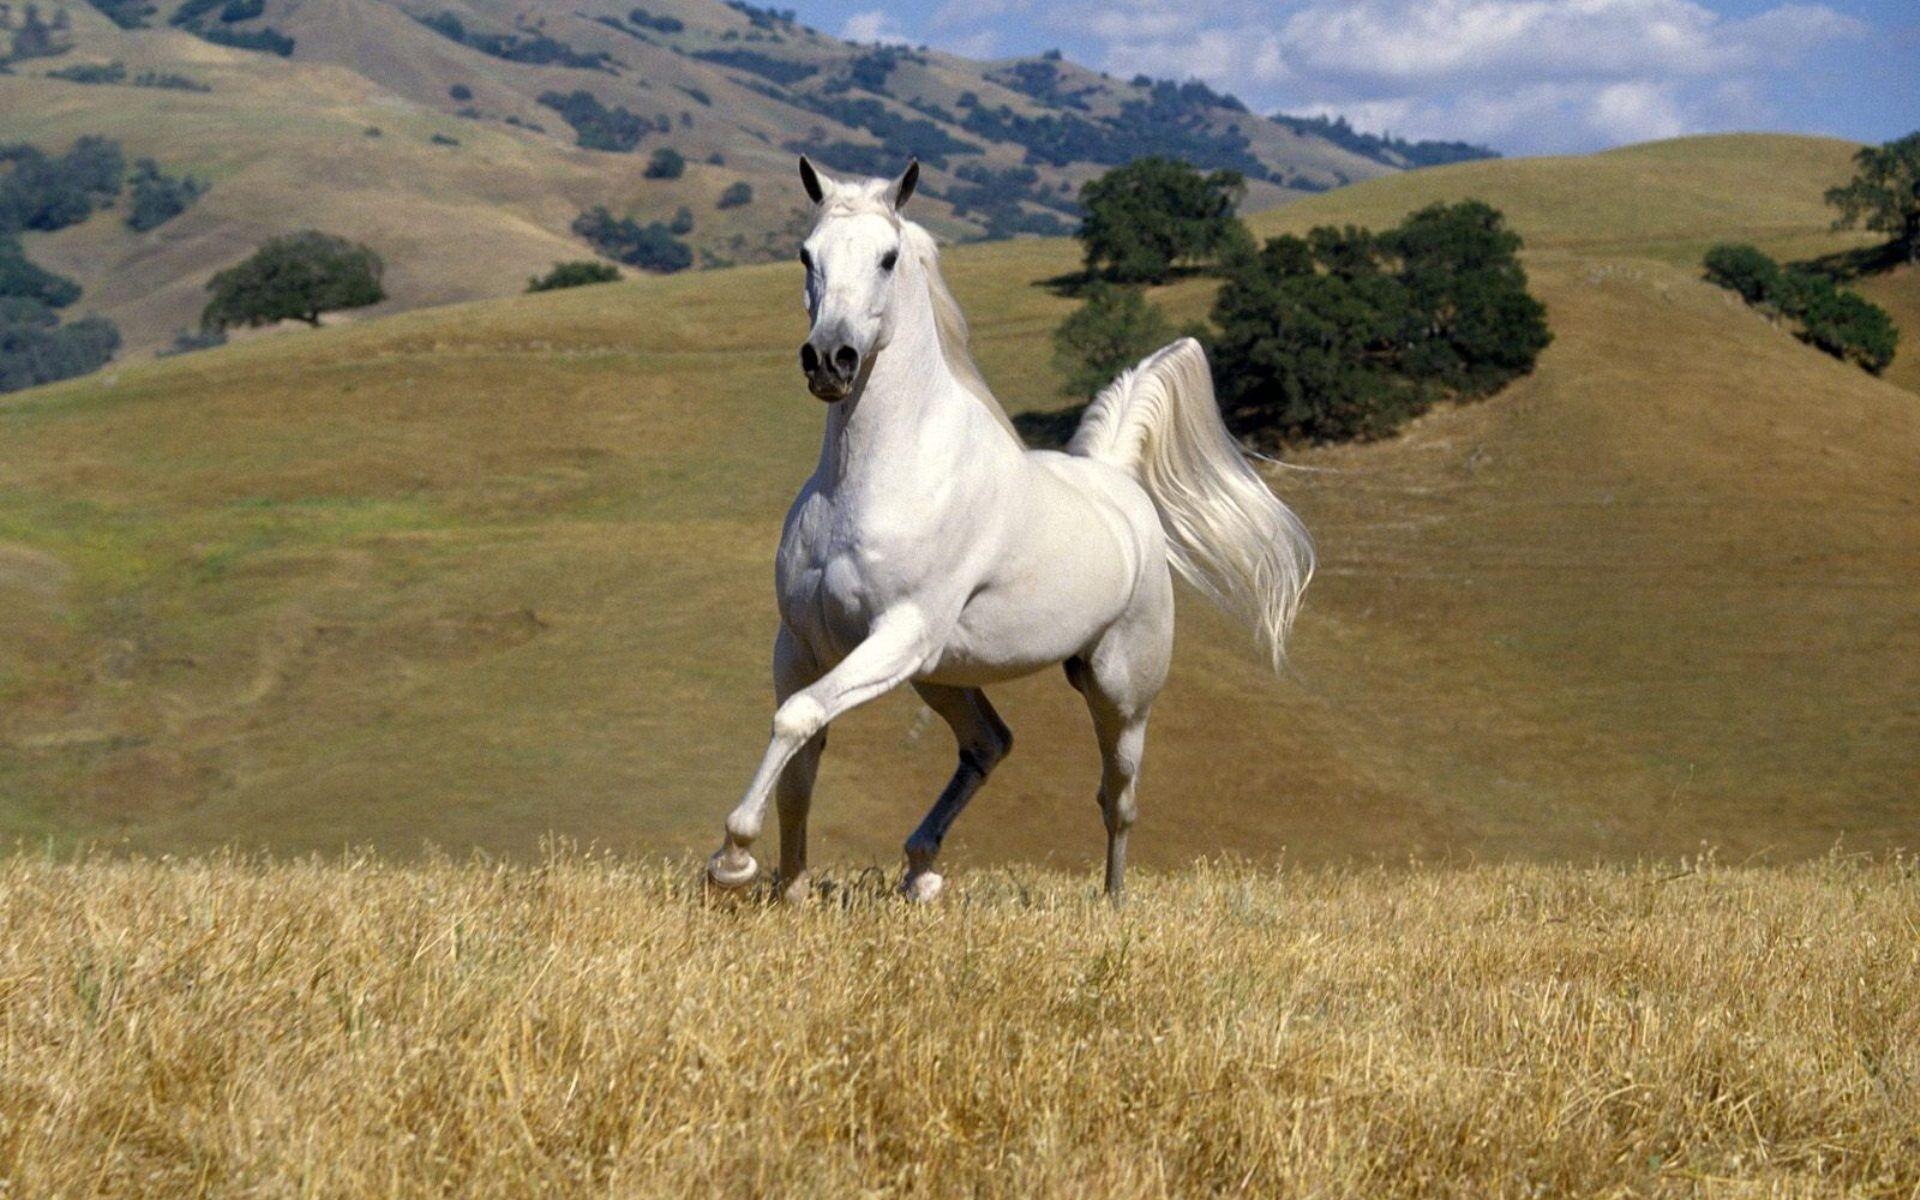 Wallpaper Horses 71 Pictures